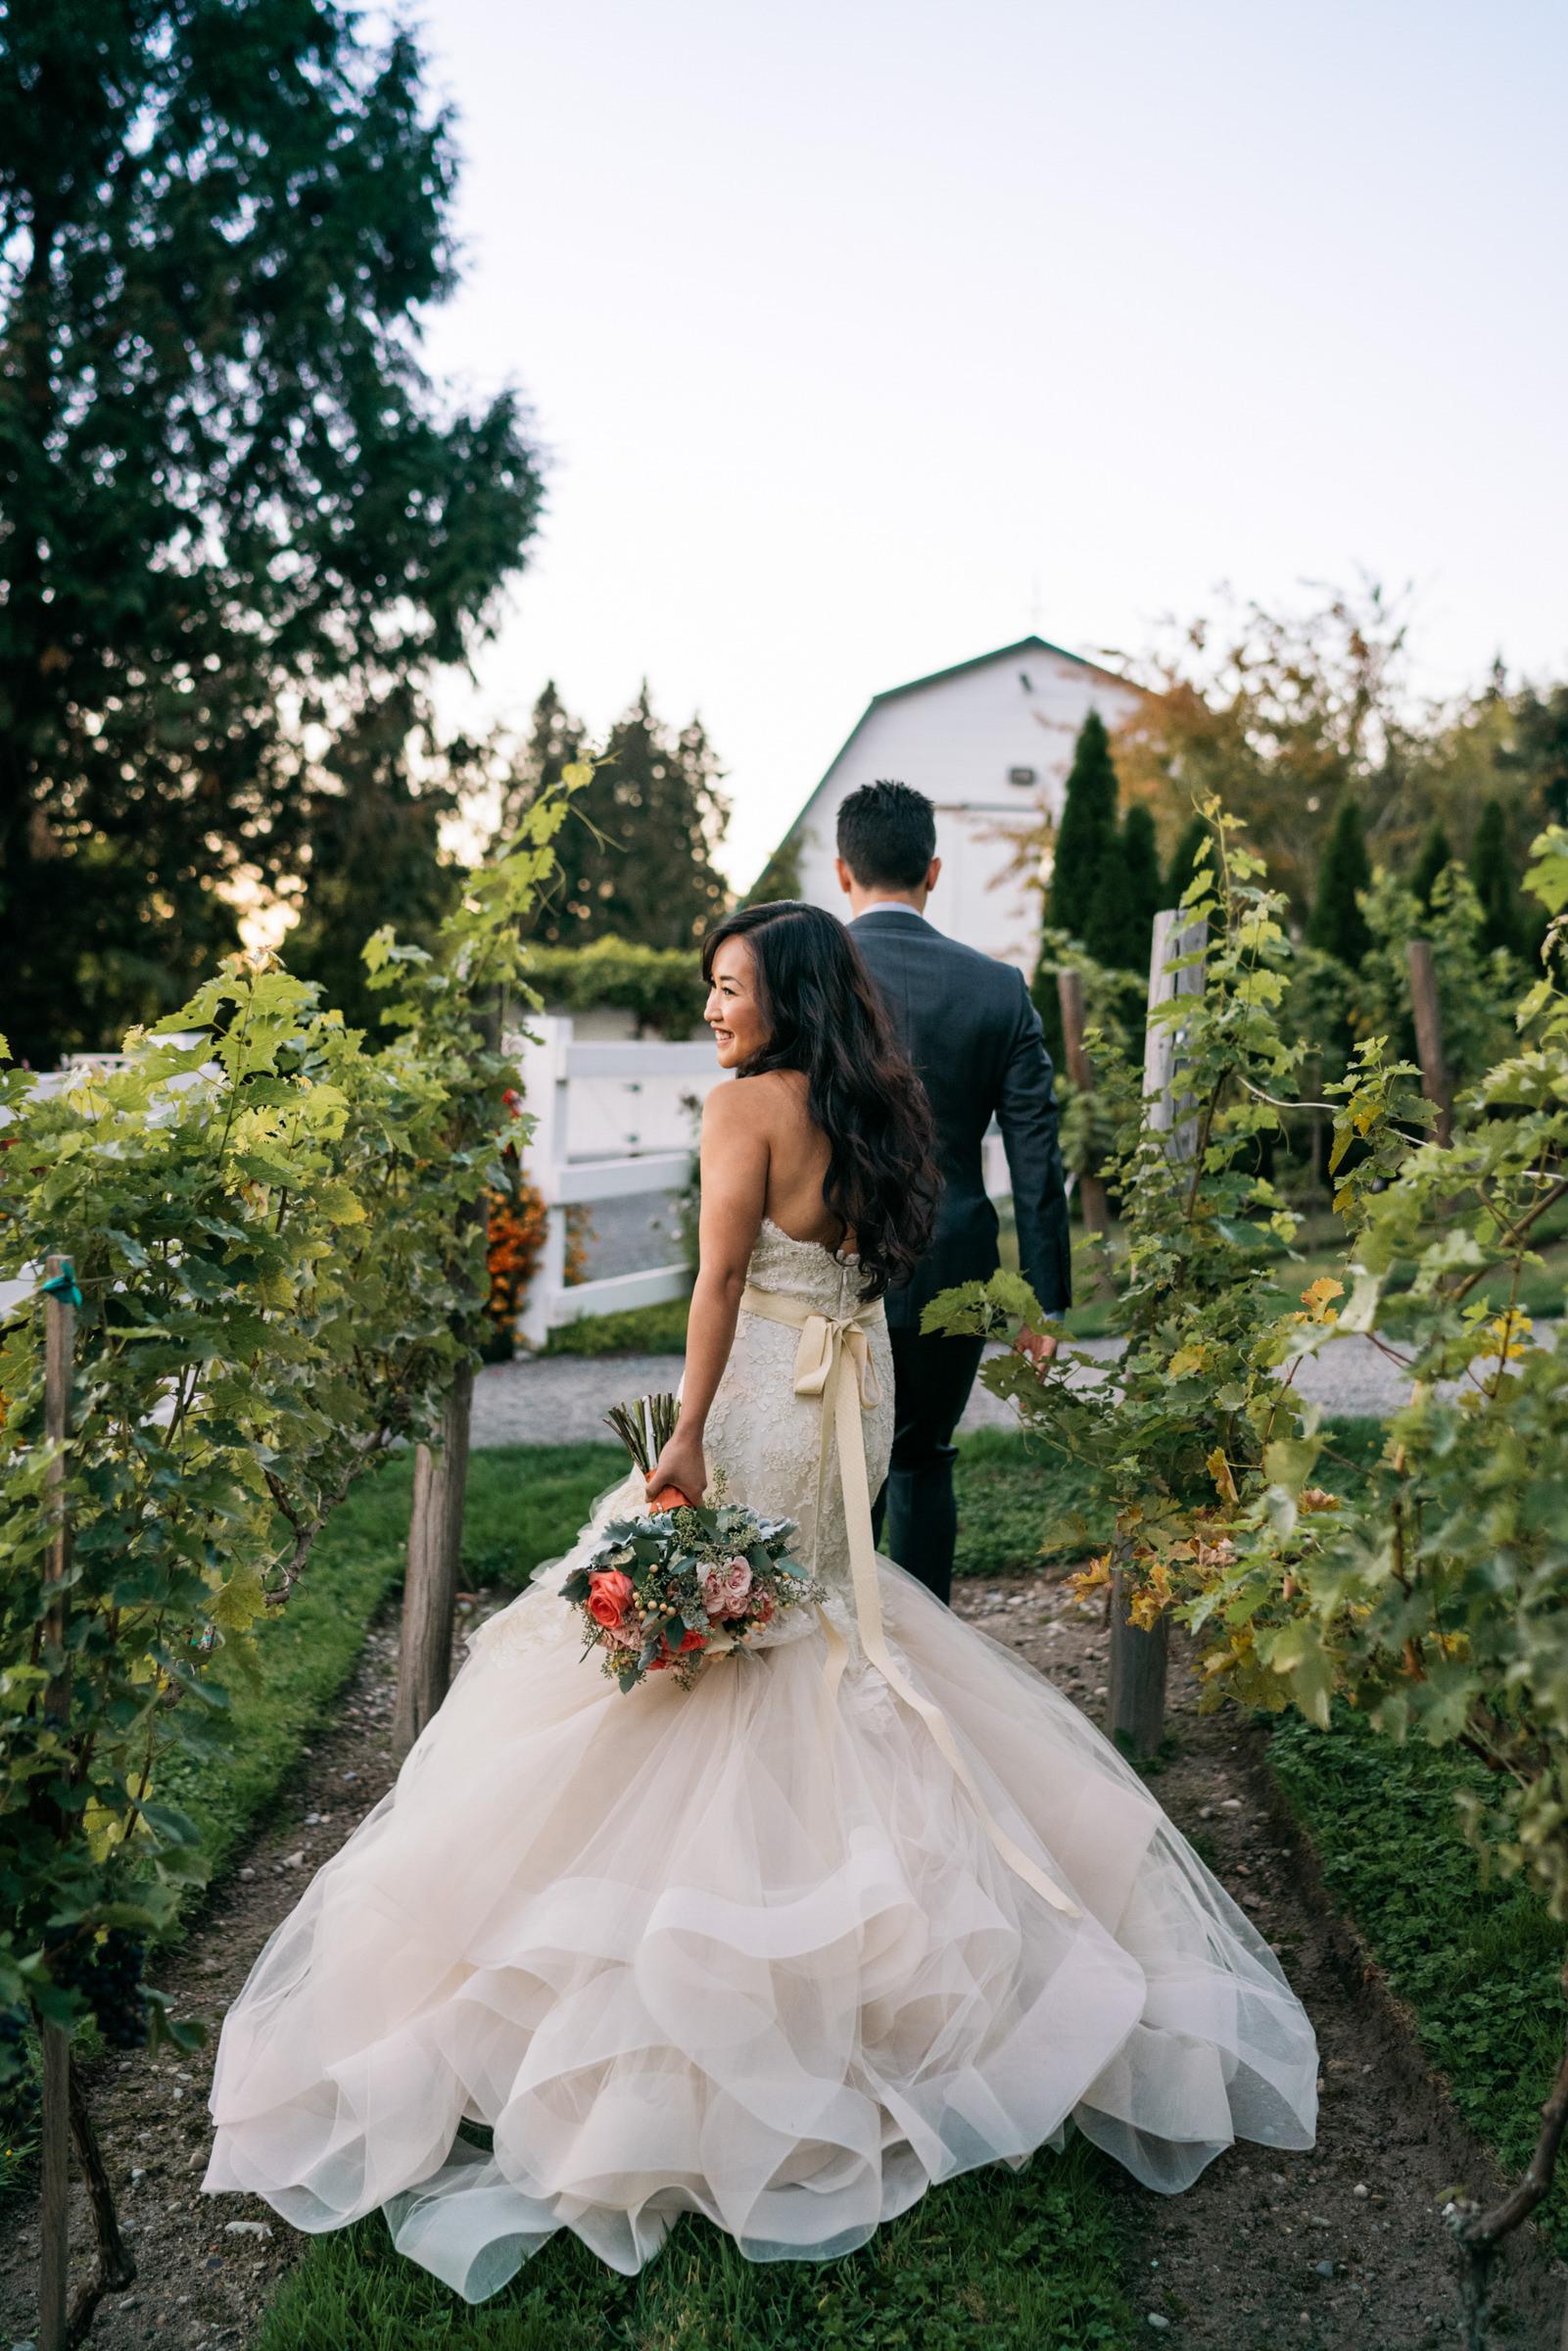 elegant-bride-in-trumpet-gown-with-groom-walk-in-grape-arbor-sasha-reiko-photography